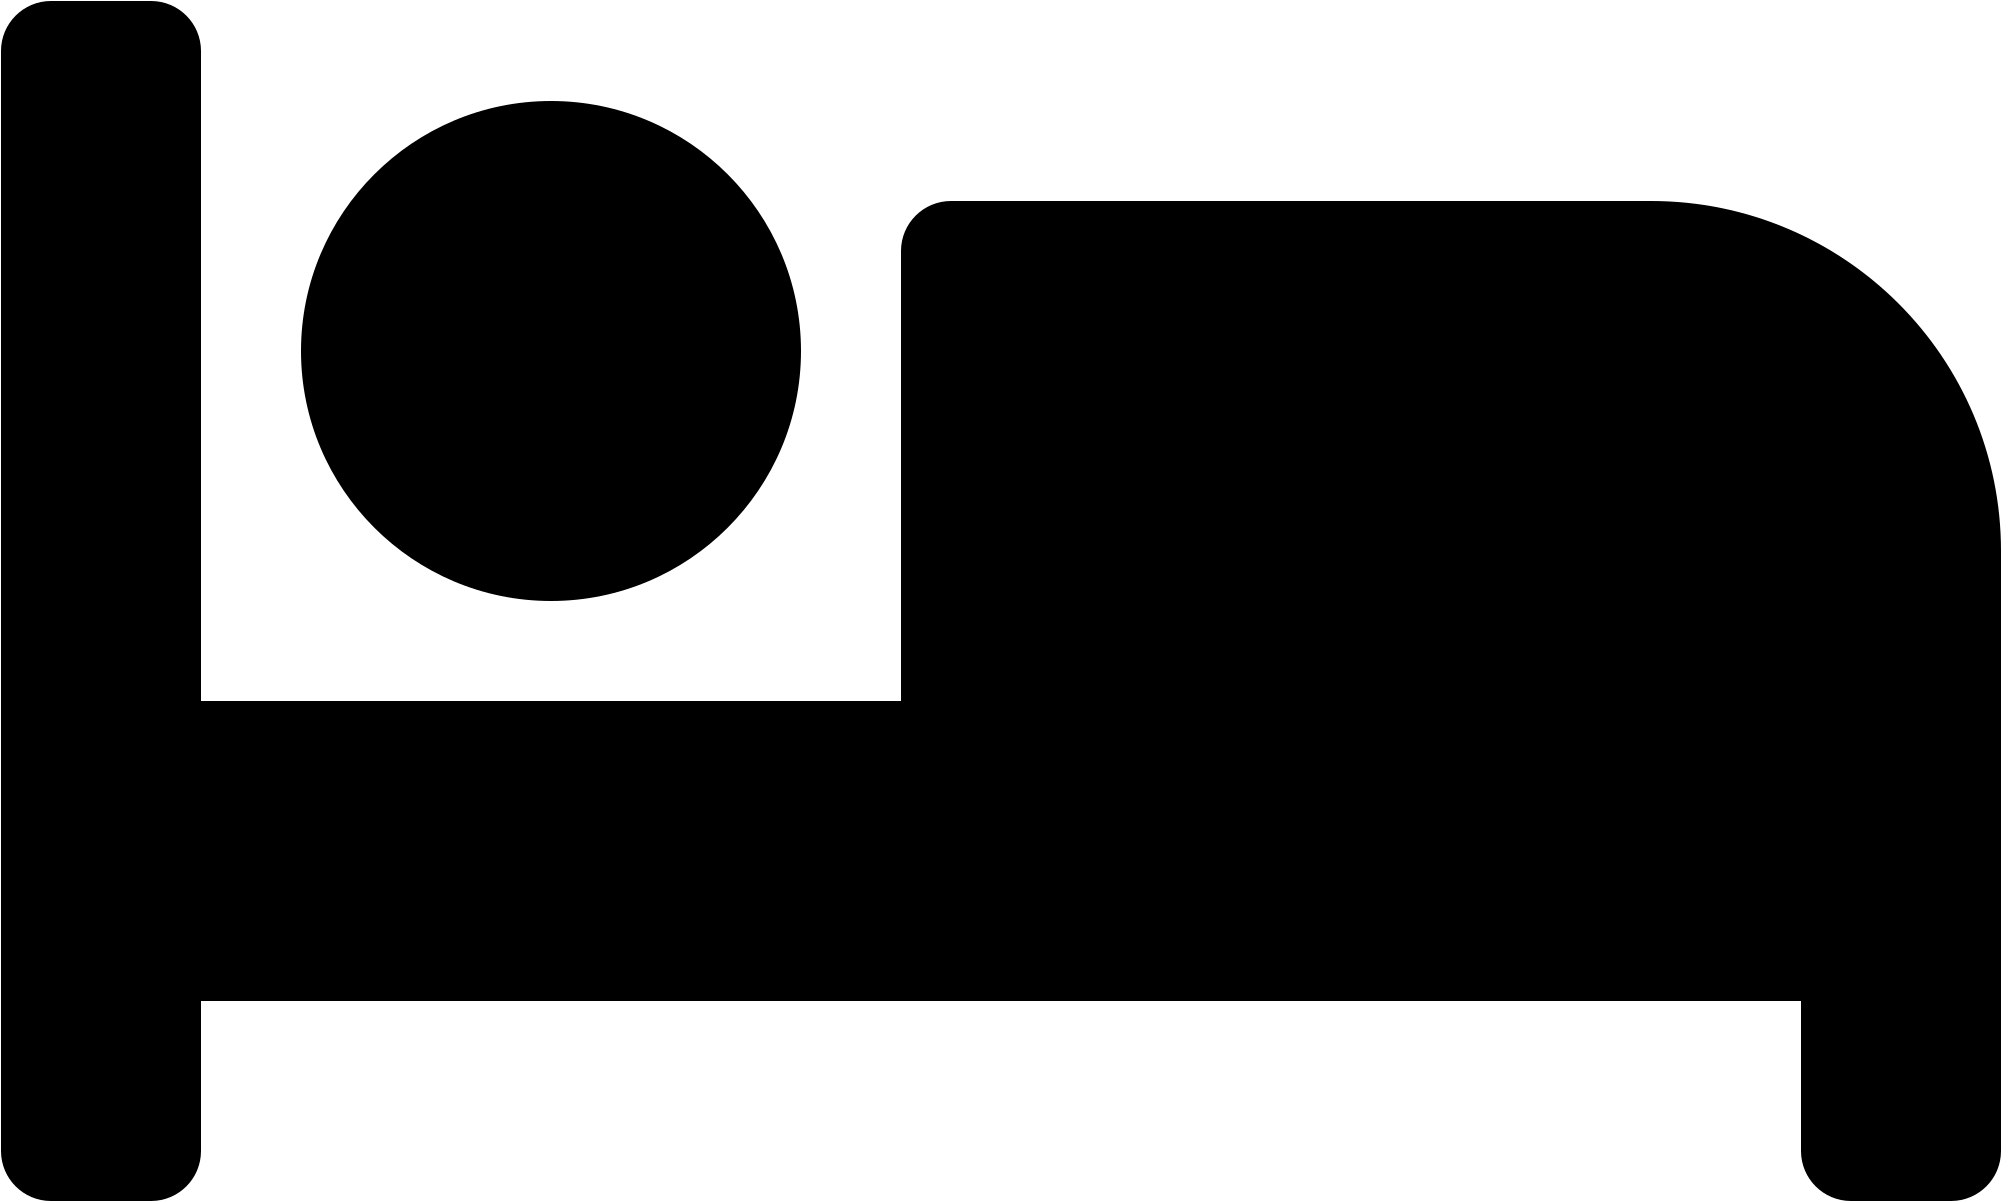 PngItem_5231596 (1)